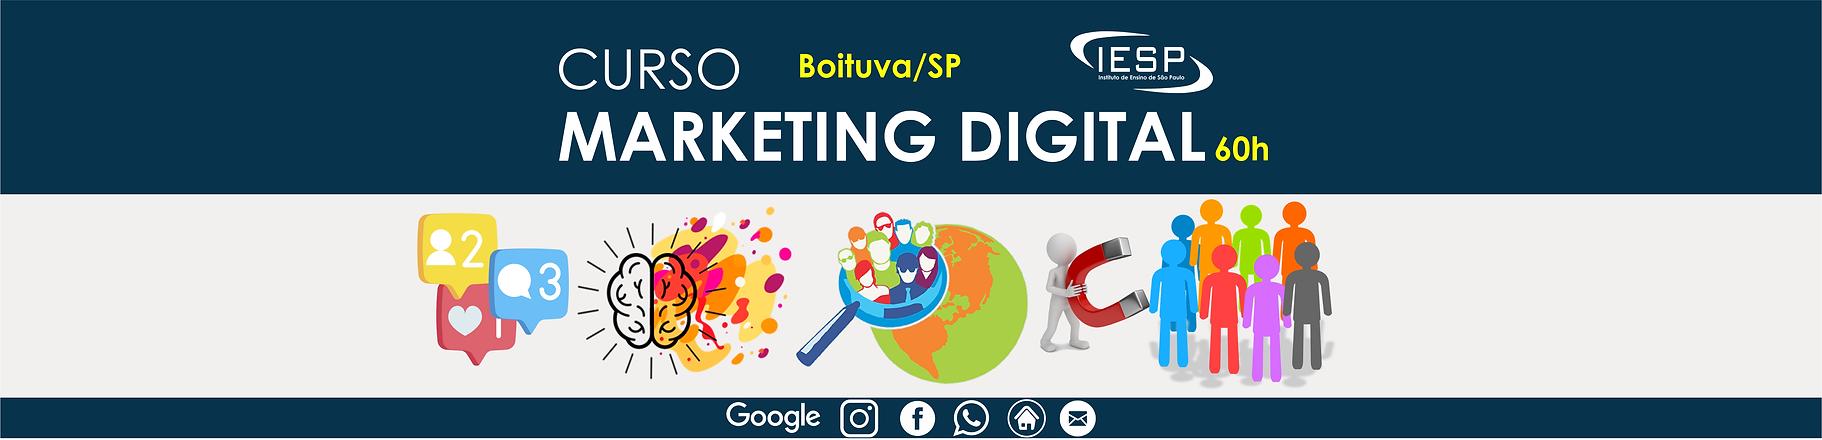 banner marketing digital new 1.png